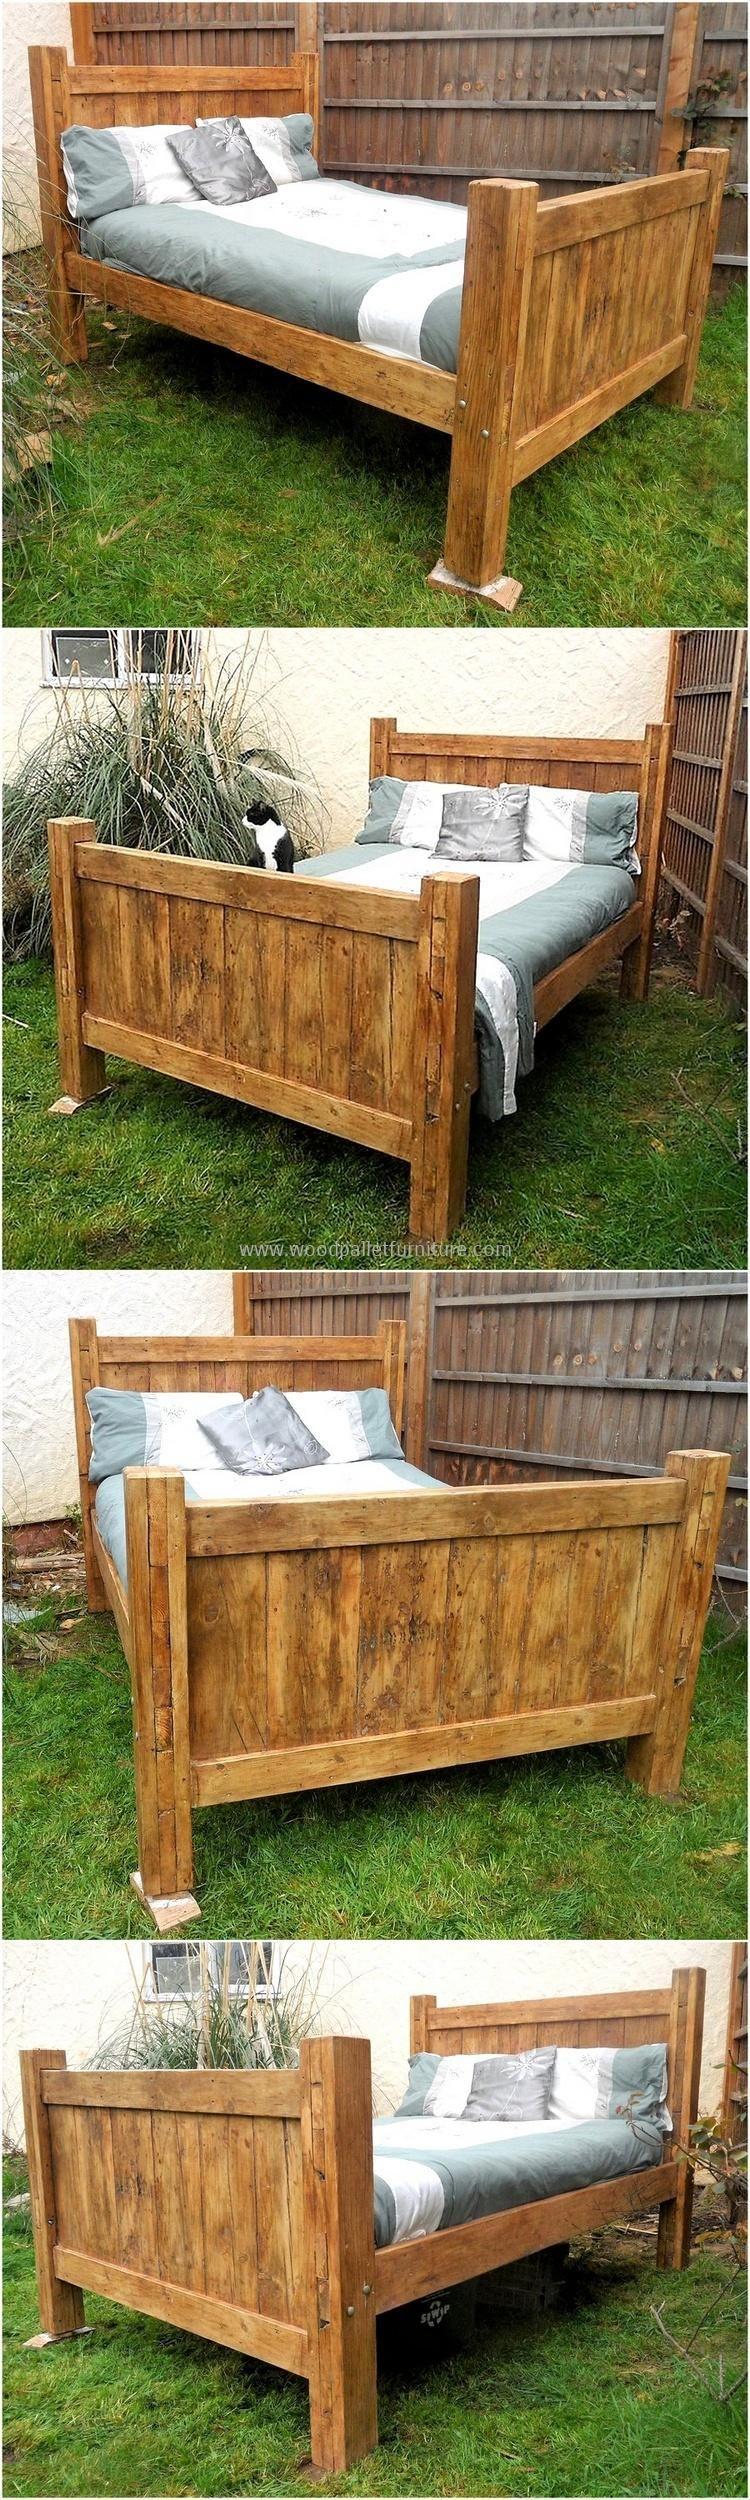 Rustic look pallet bed wood pallets pinterest pallets pallet